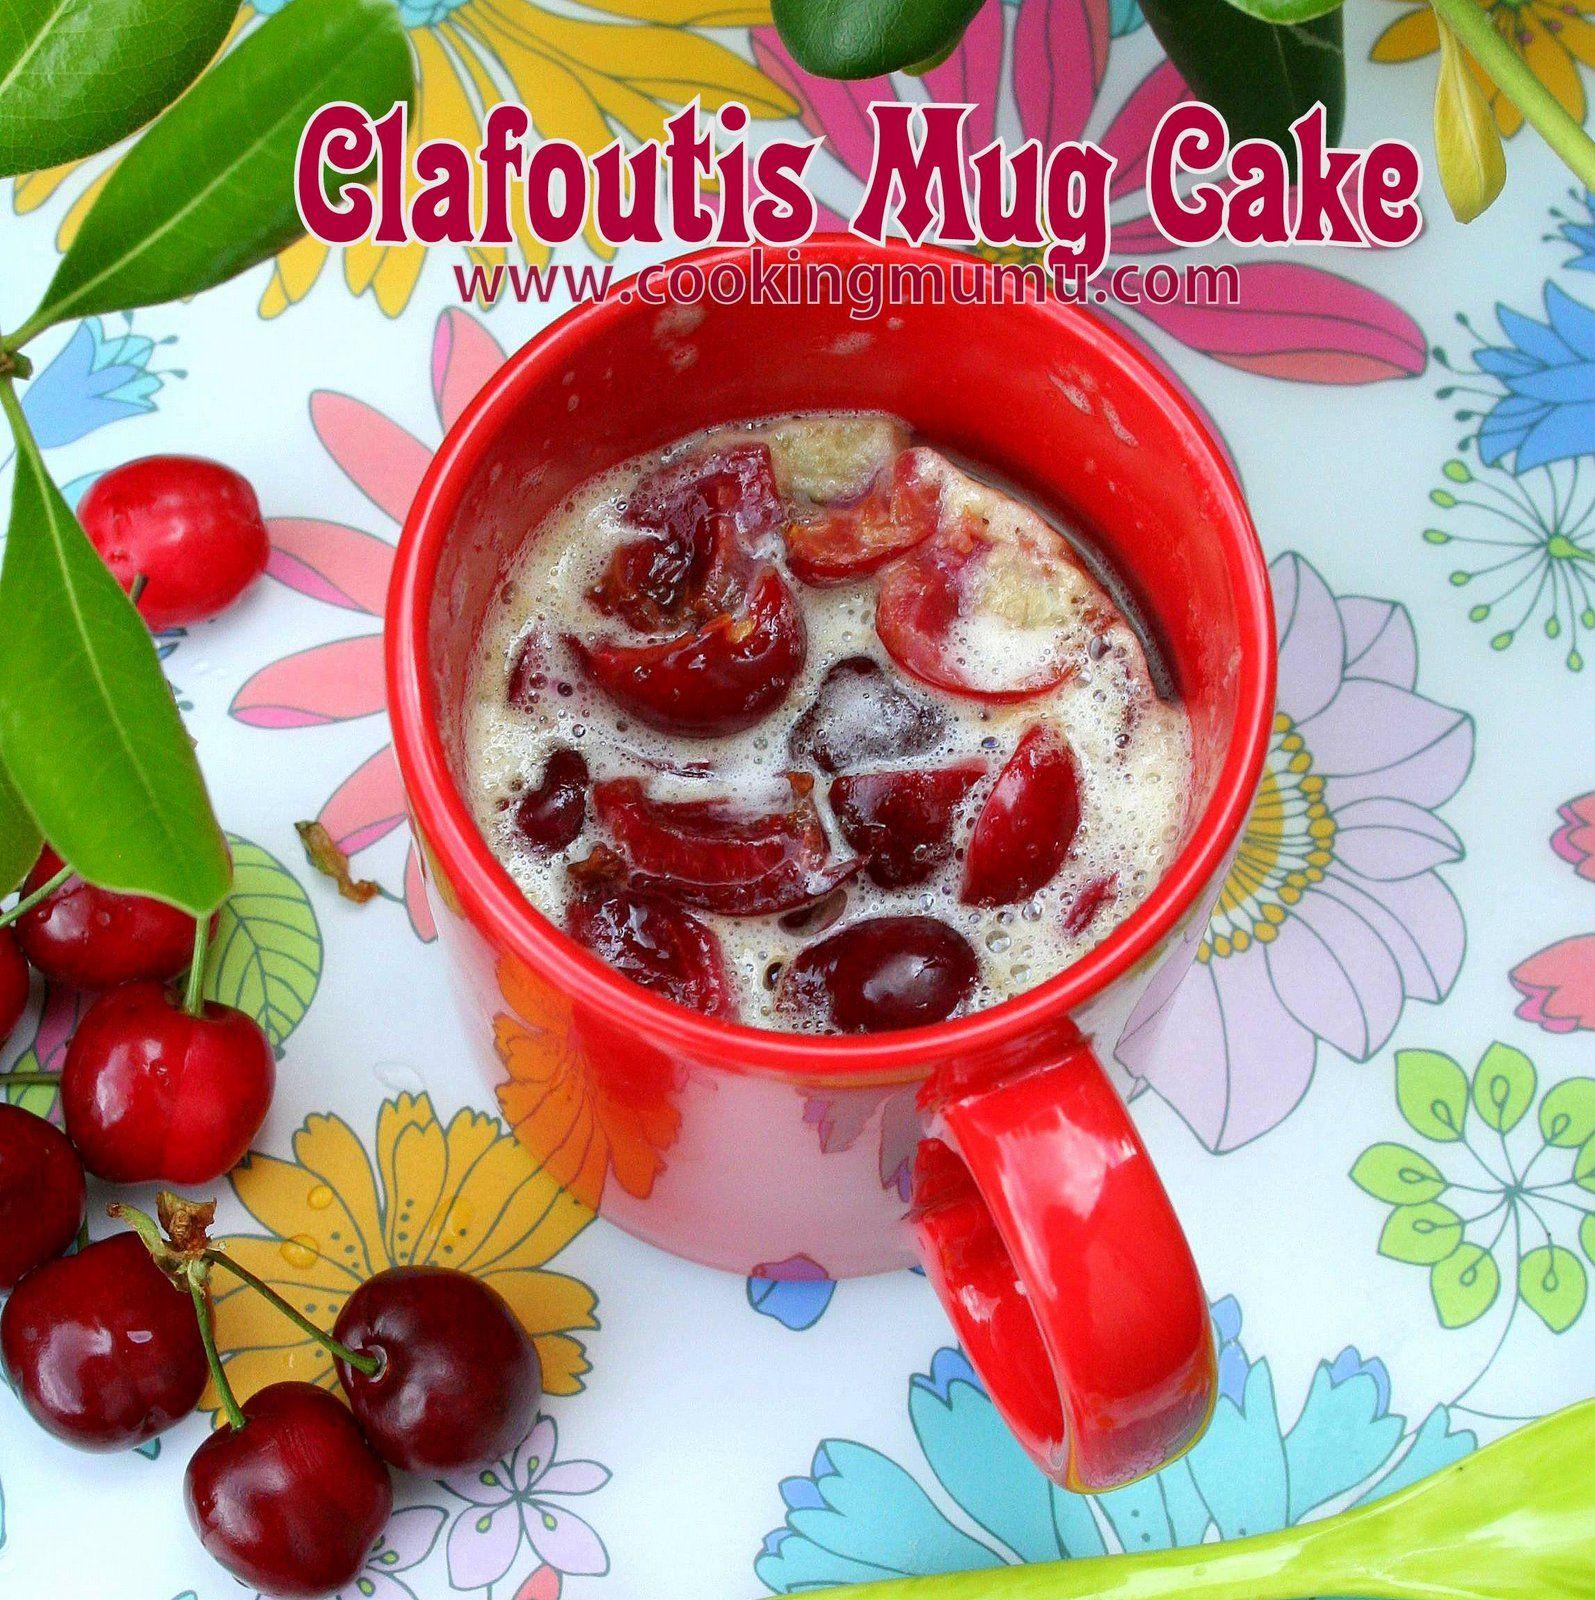 Un clafoutis version mug cake : 5mn de préparation, 1 micro-ondes et 0 vaisselle (ou presque)